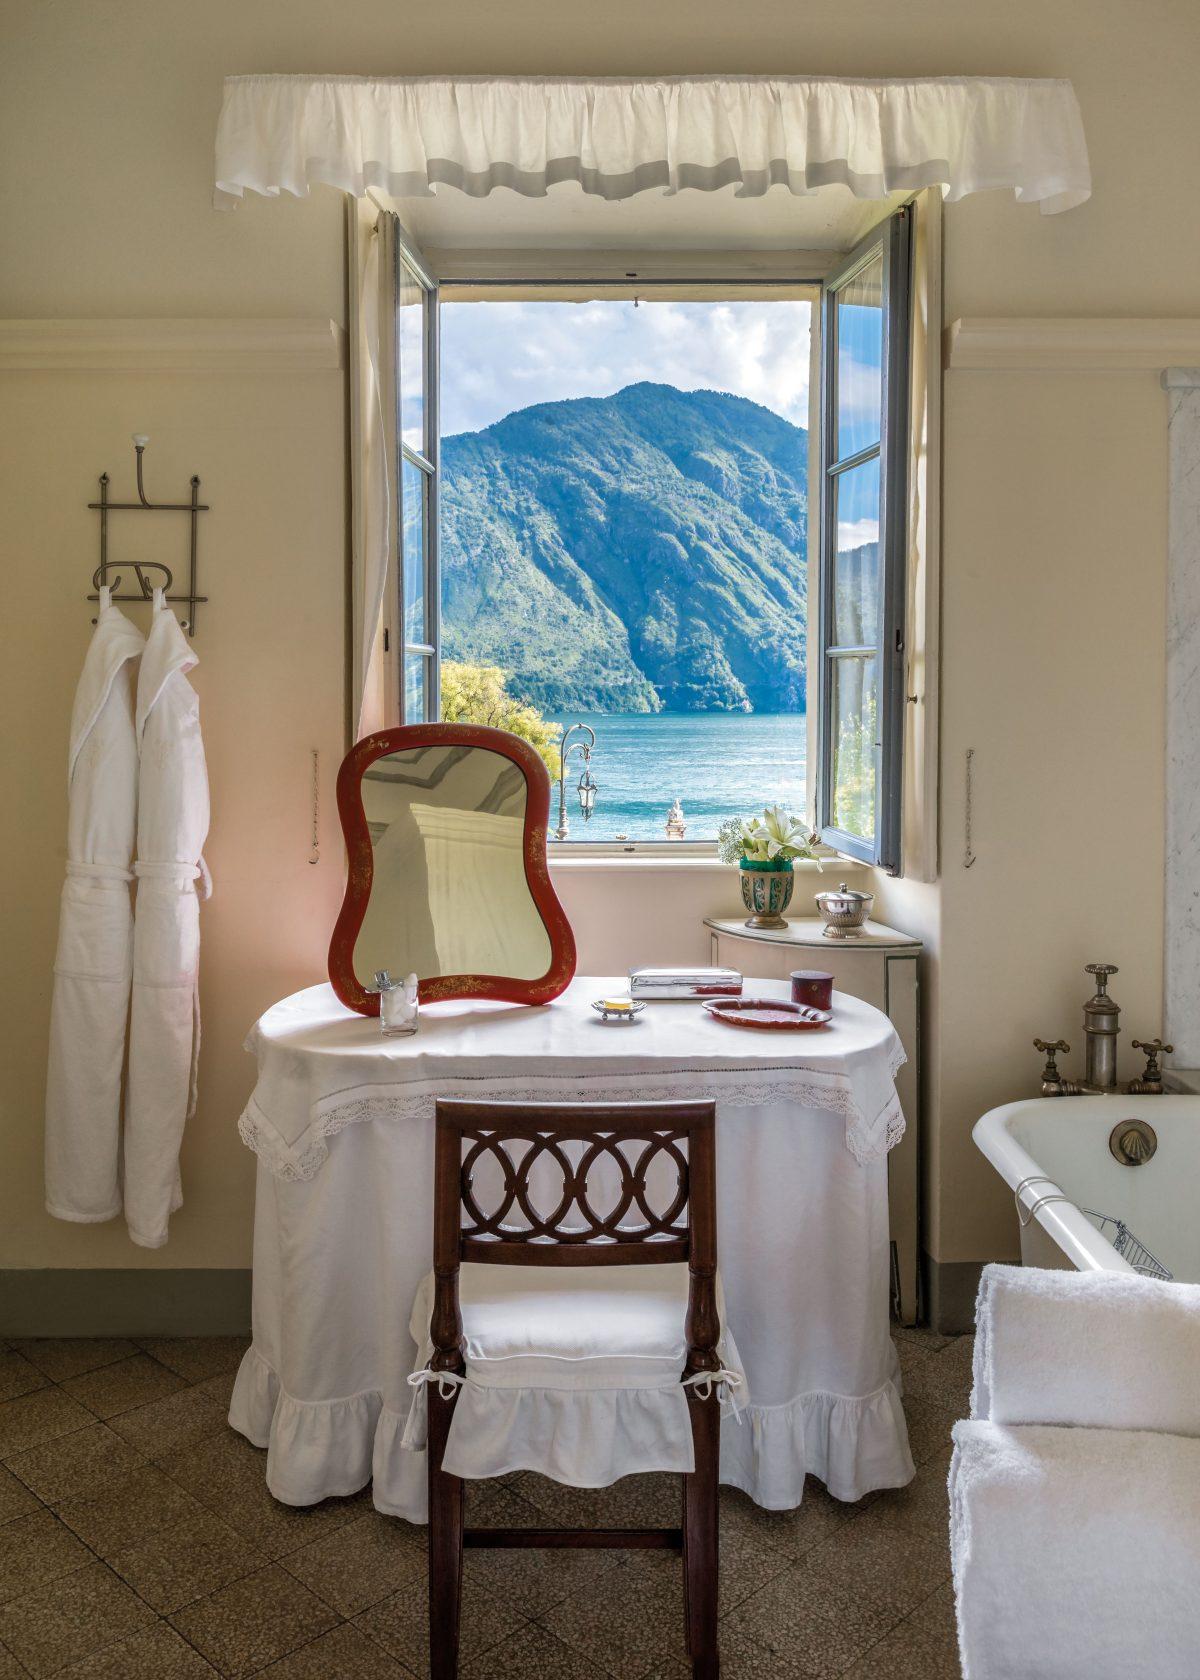 25 - Villa Sola Cabiati - Suite Bathroom 3